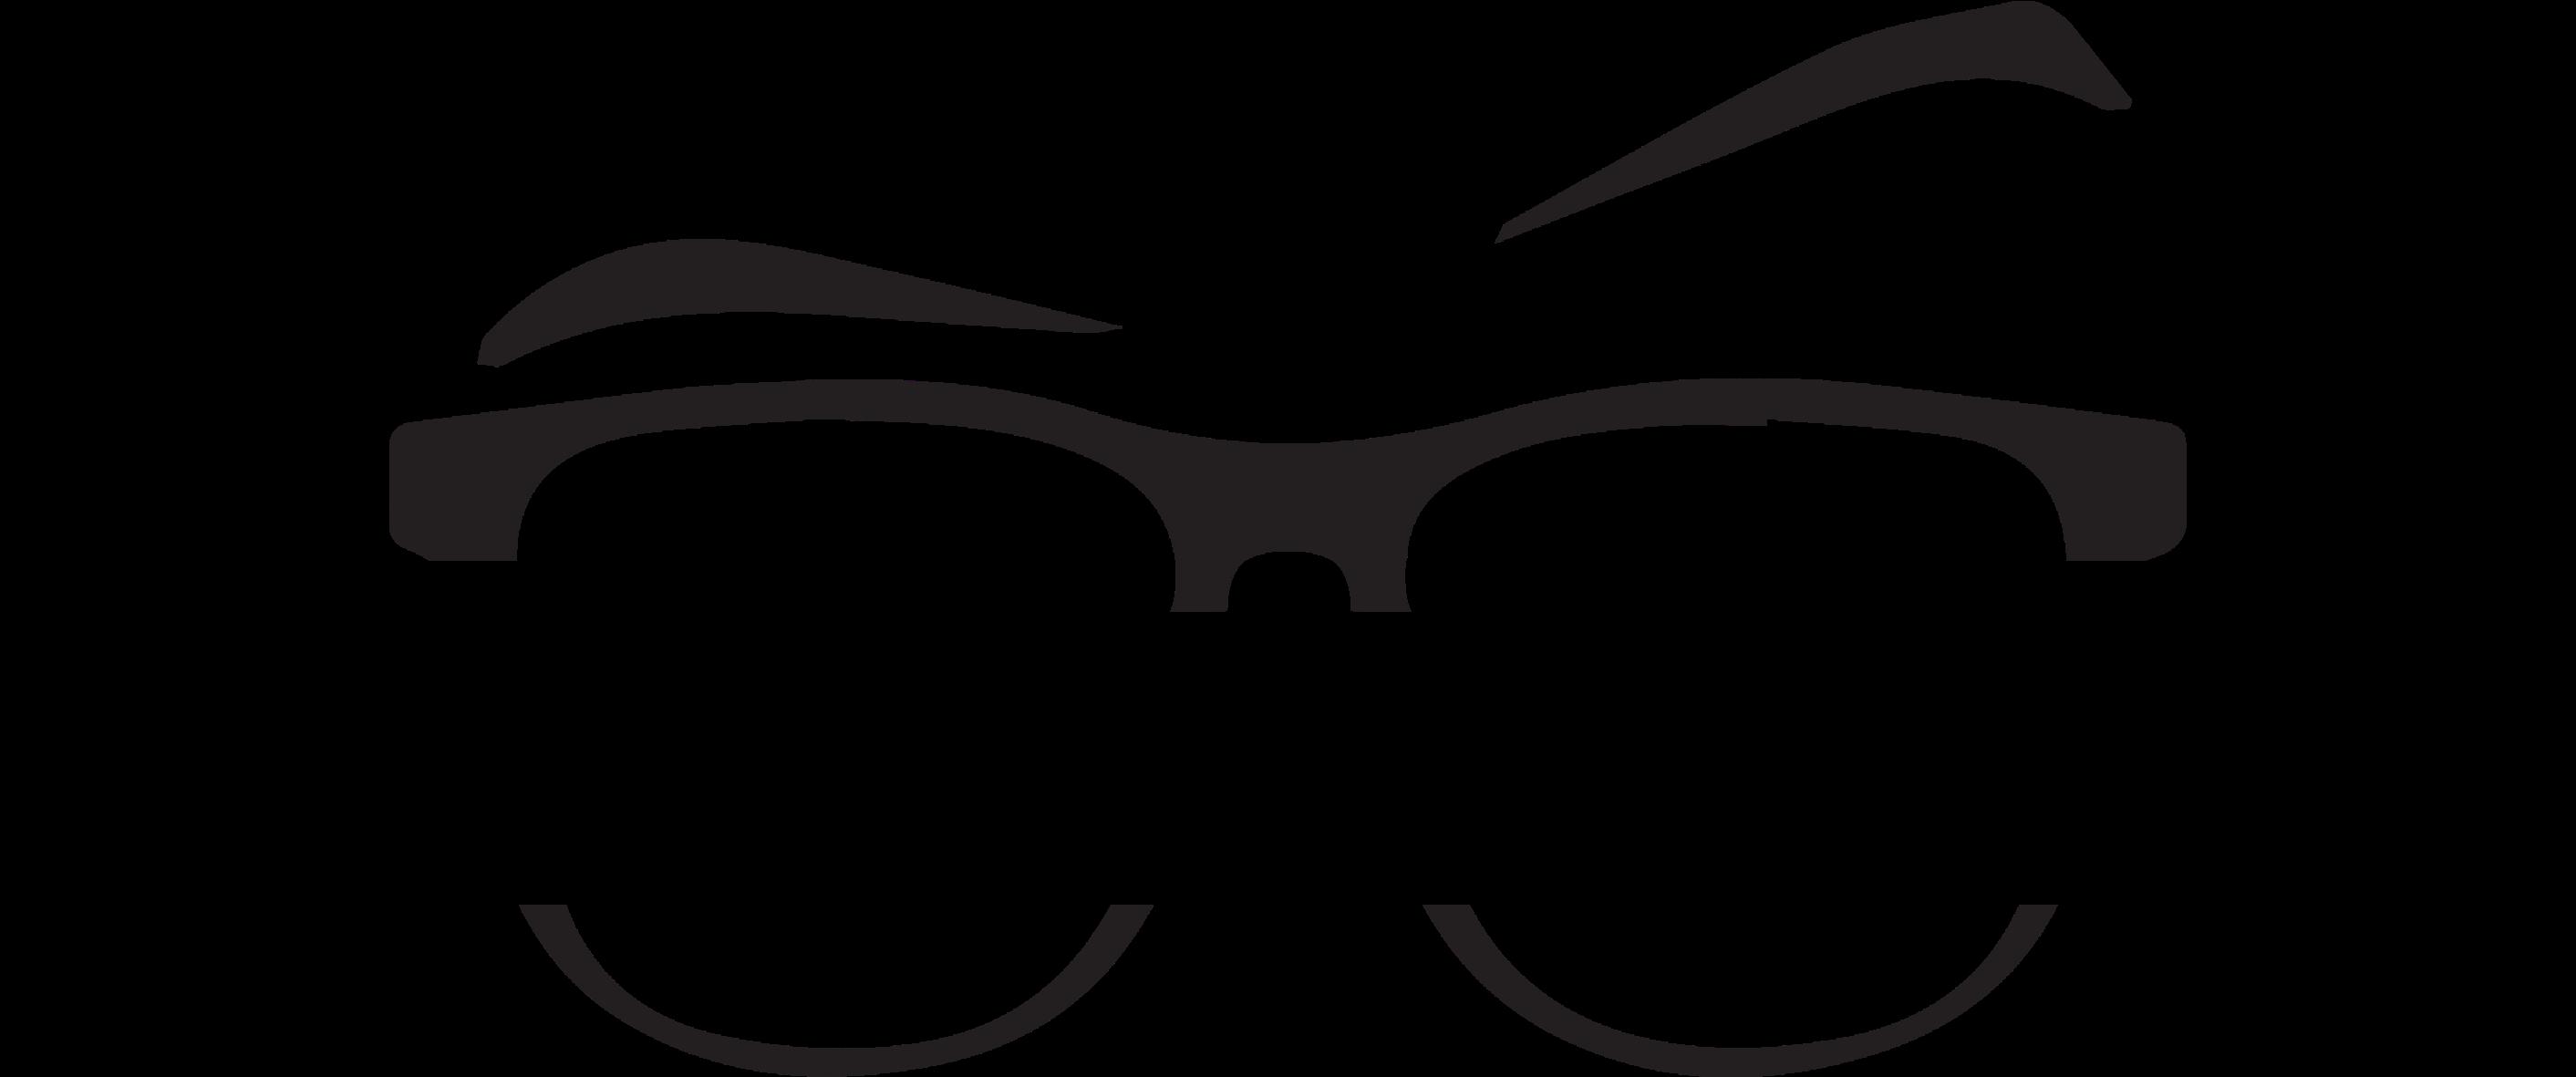 Free Big Glasses Cliparts, Download Free Clip Art, Free Clip Art on Clipart  Library